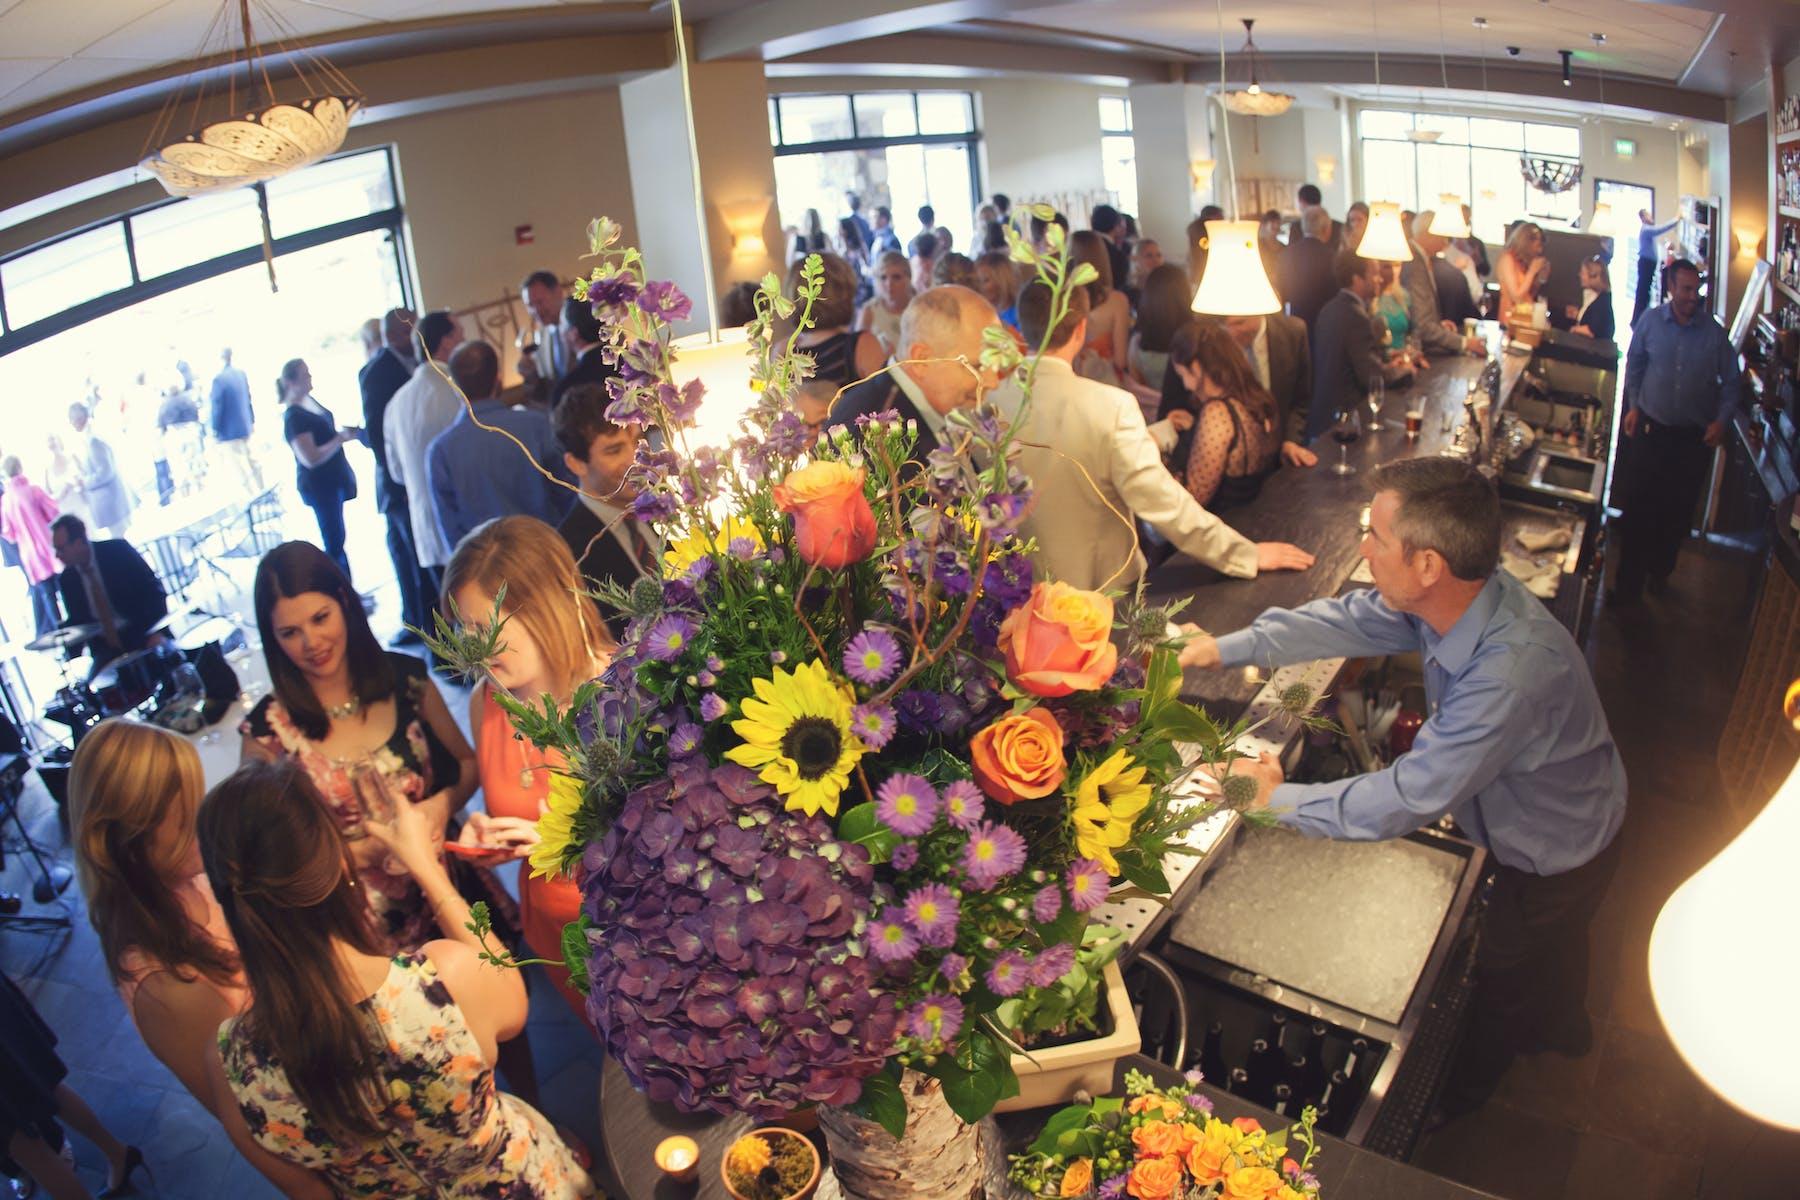 Larkspur Wedding Venue Vail Colorado Mountain Patio Outdoors Bar